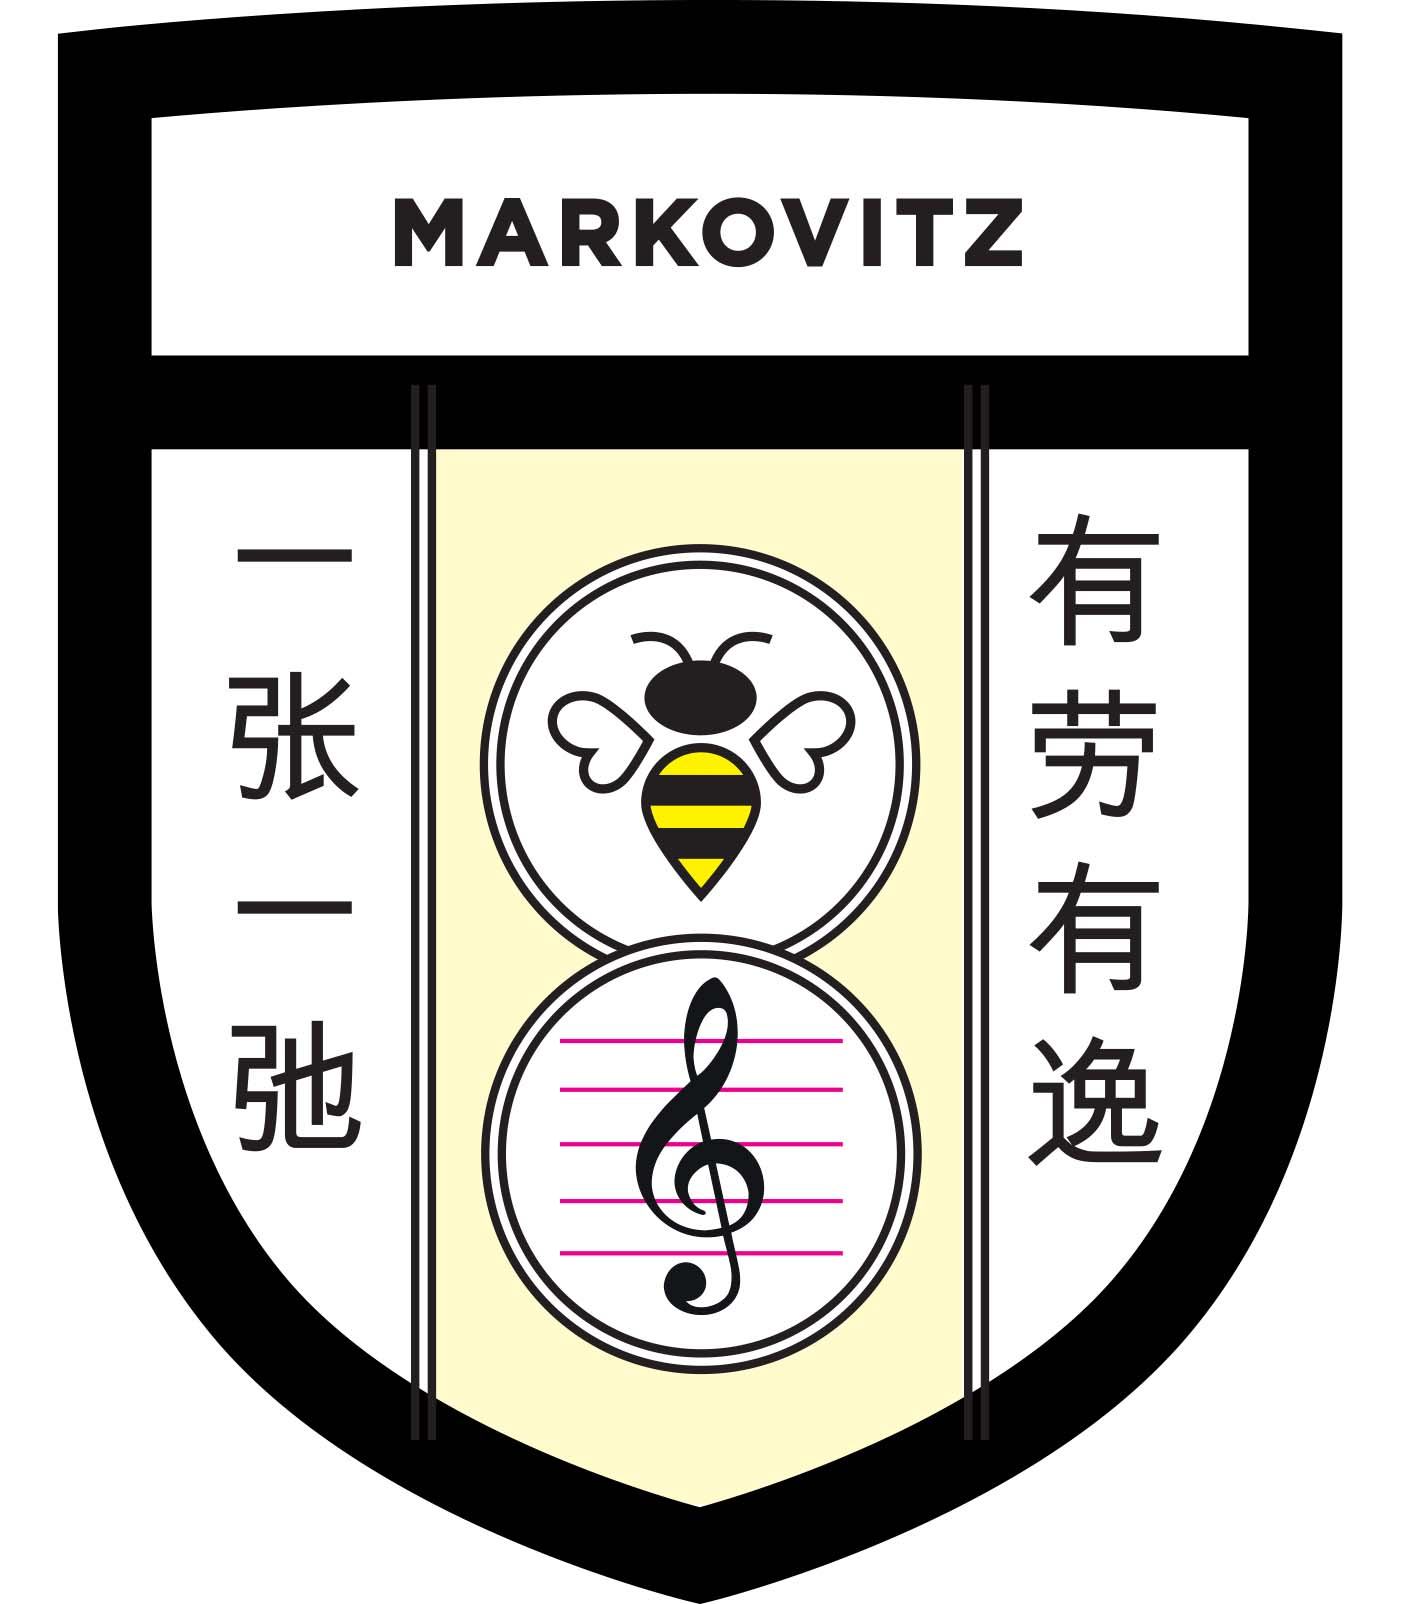 Markovitz Shield